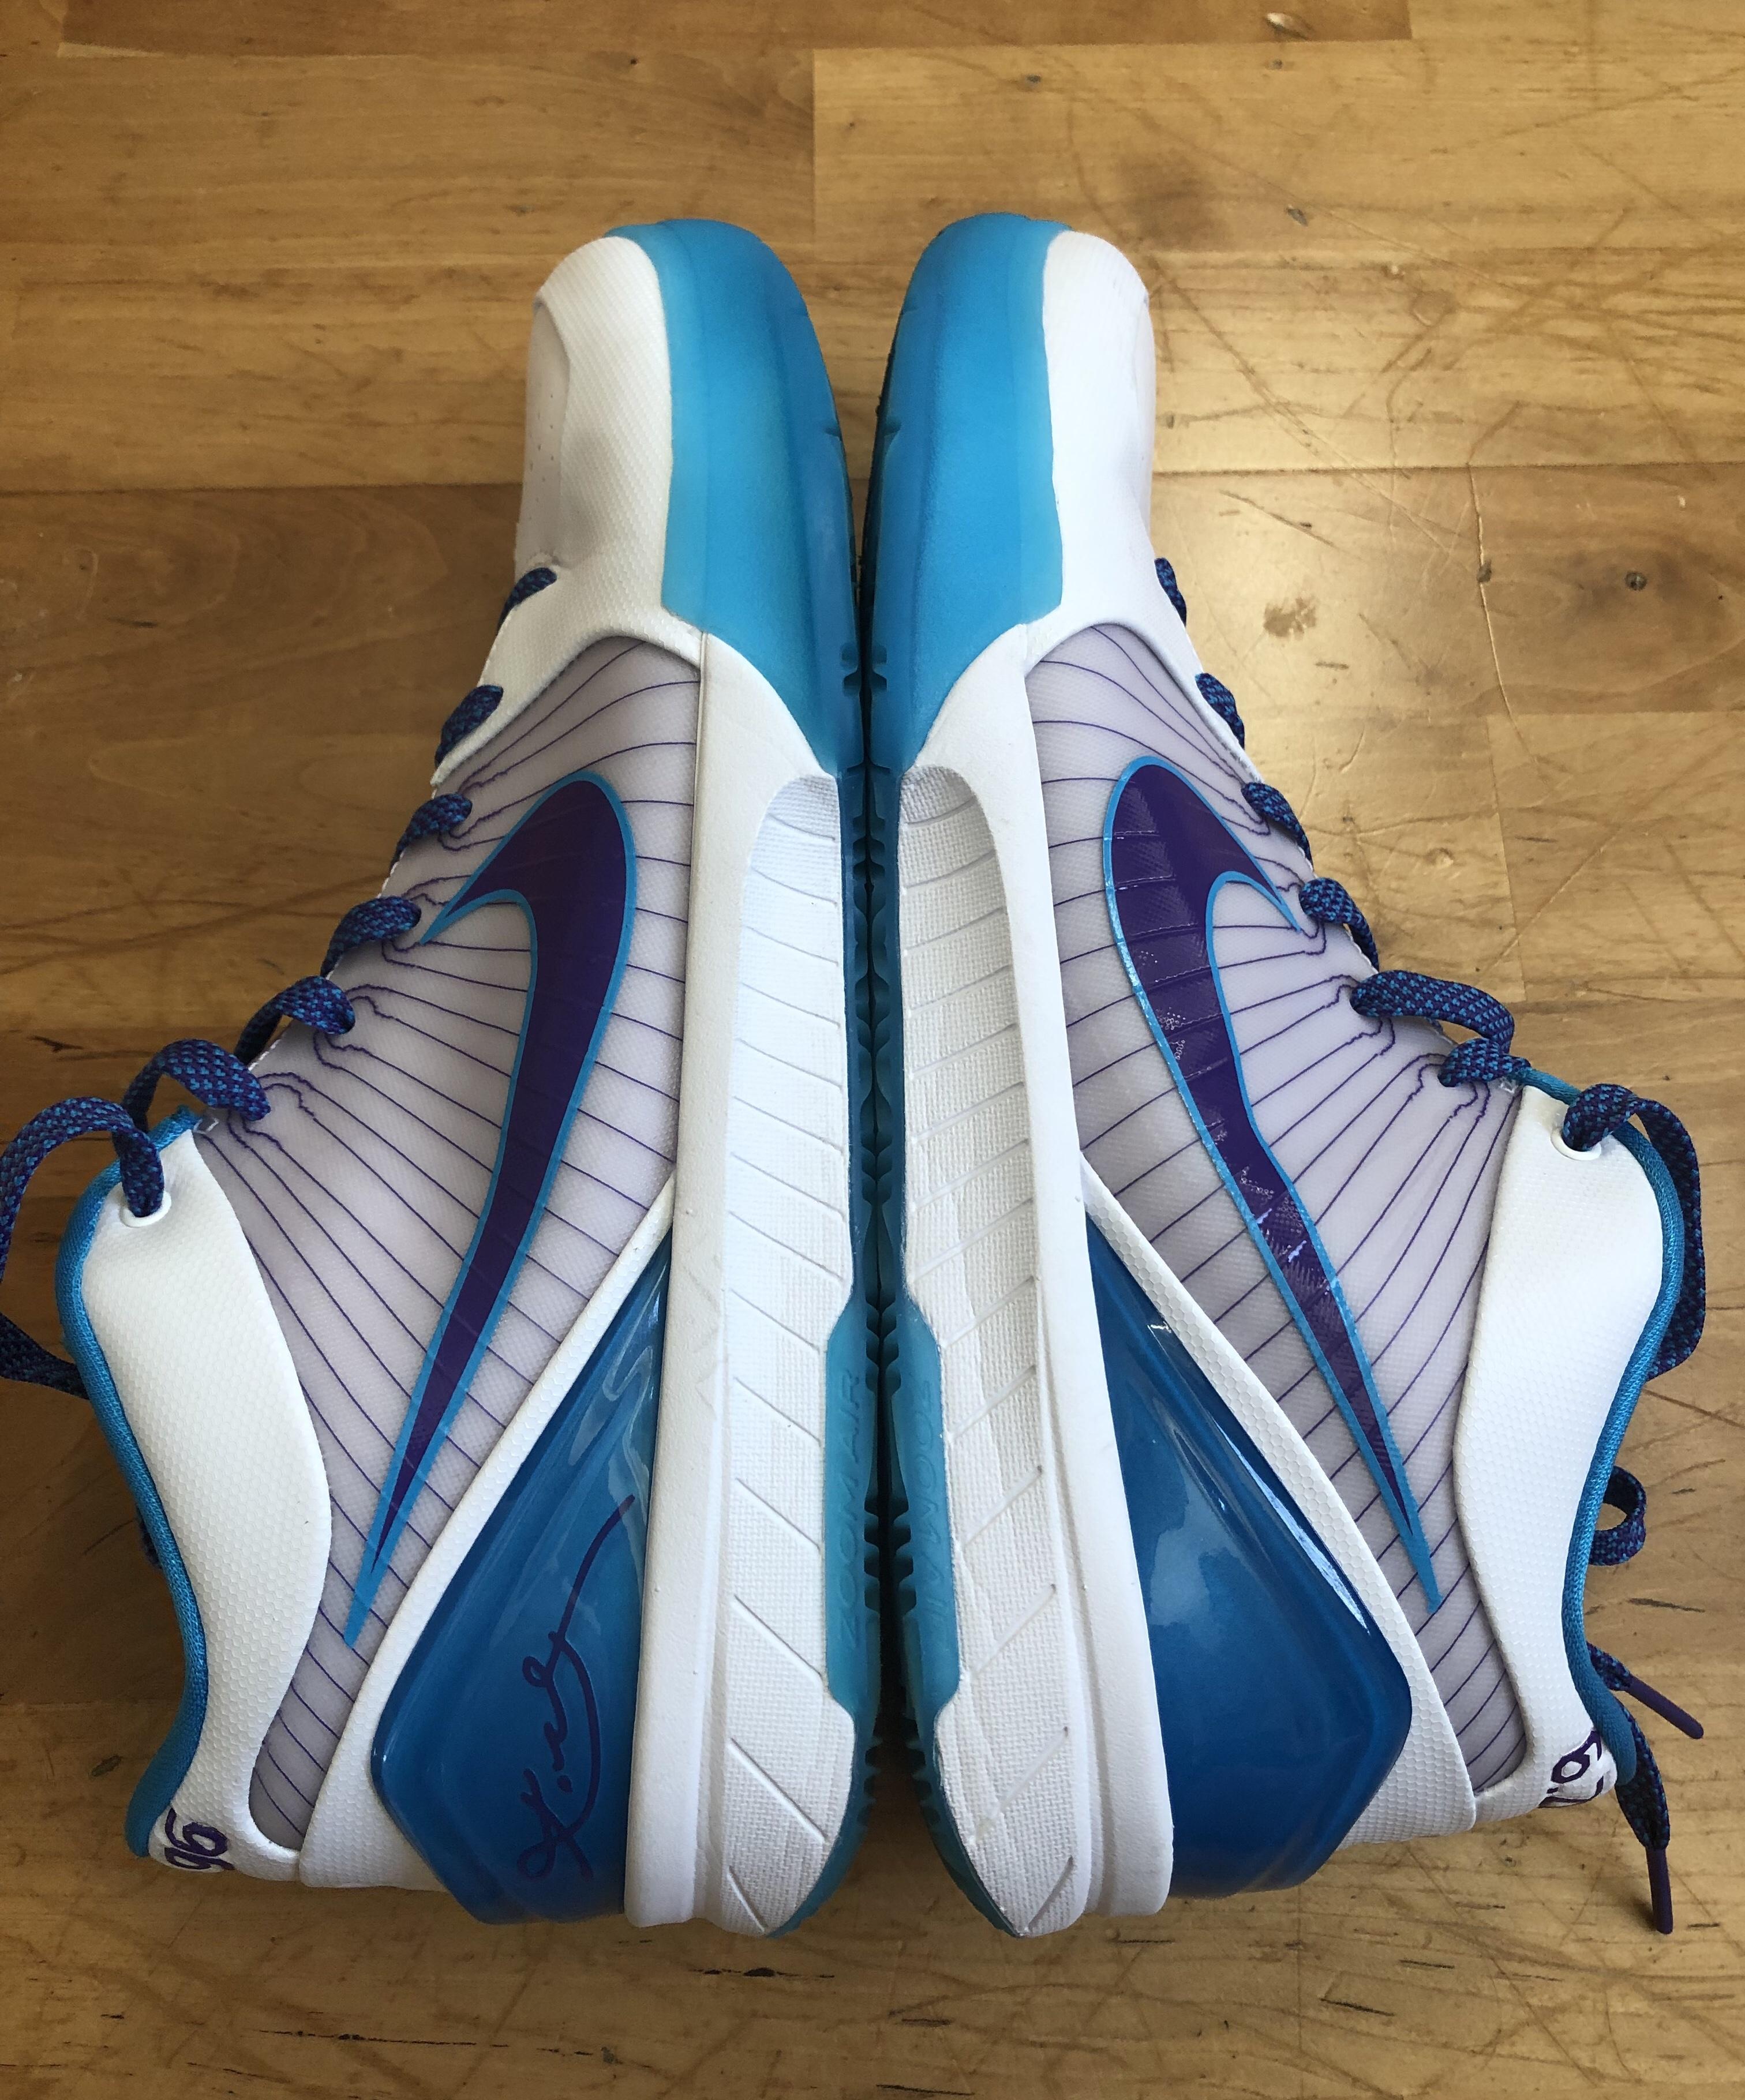 Nike Kobe IV 4 Protro Retro Performance